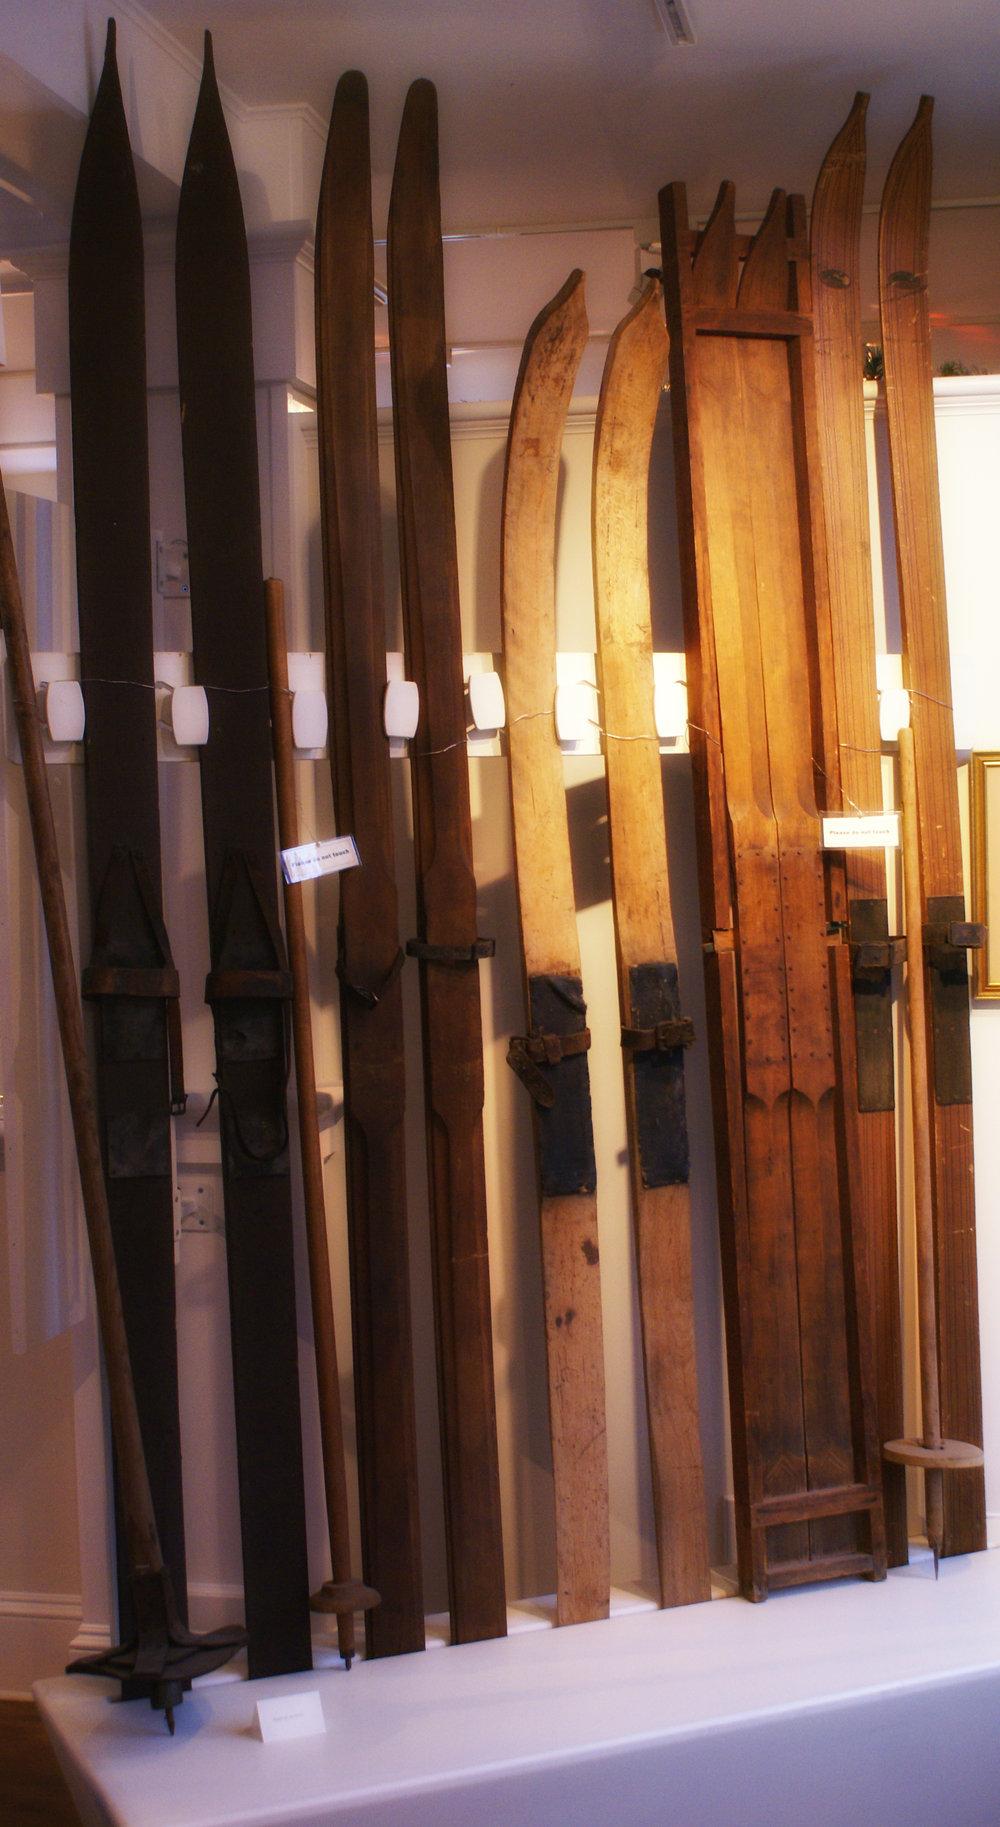 Wooden Skis.jpg